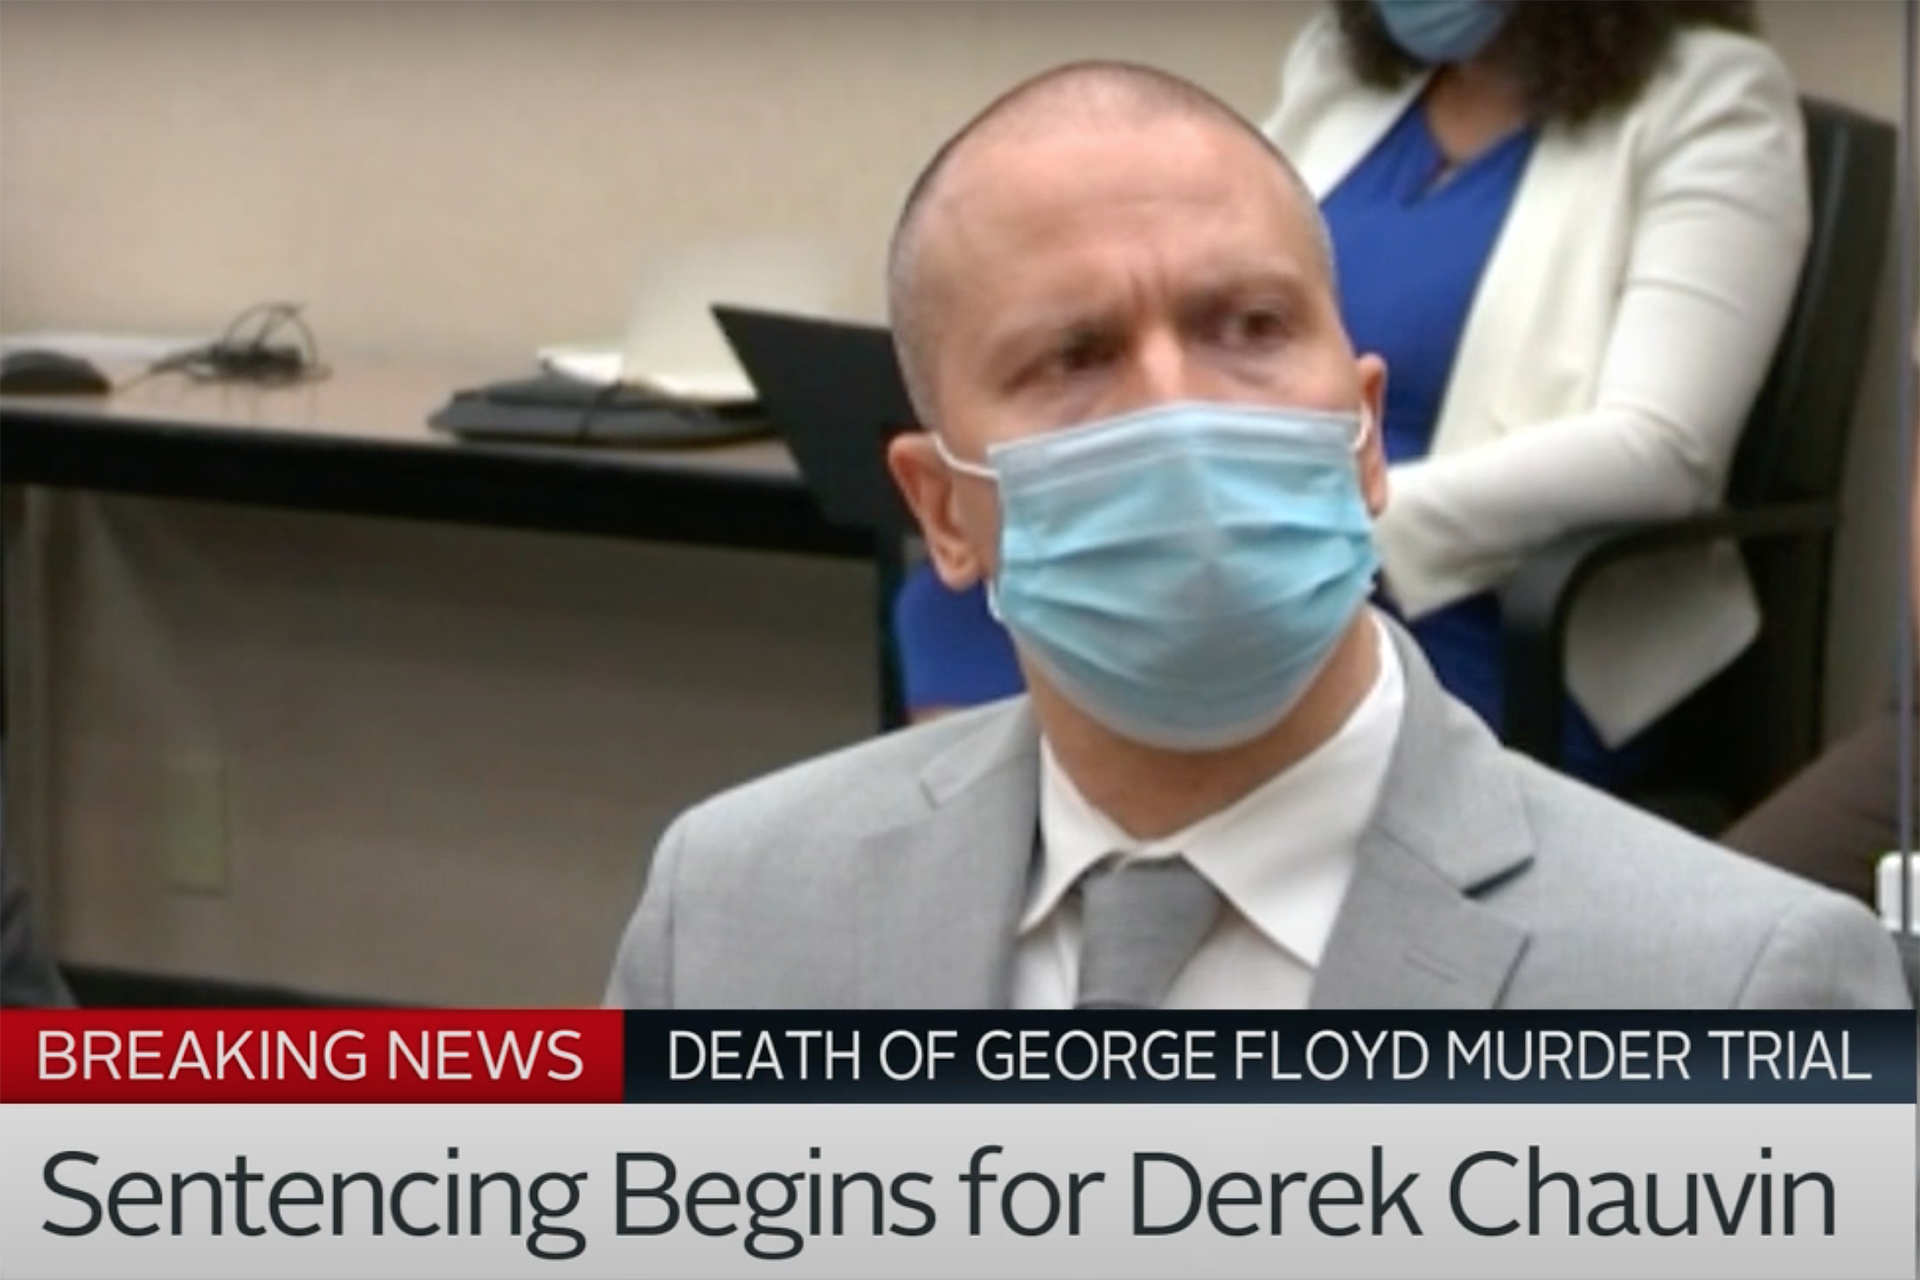 Derek Chauvin sentenced to 22.5 years in prison for murder of George Floyd